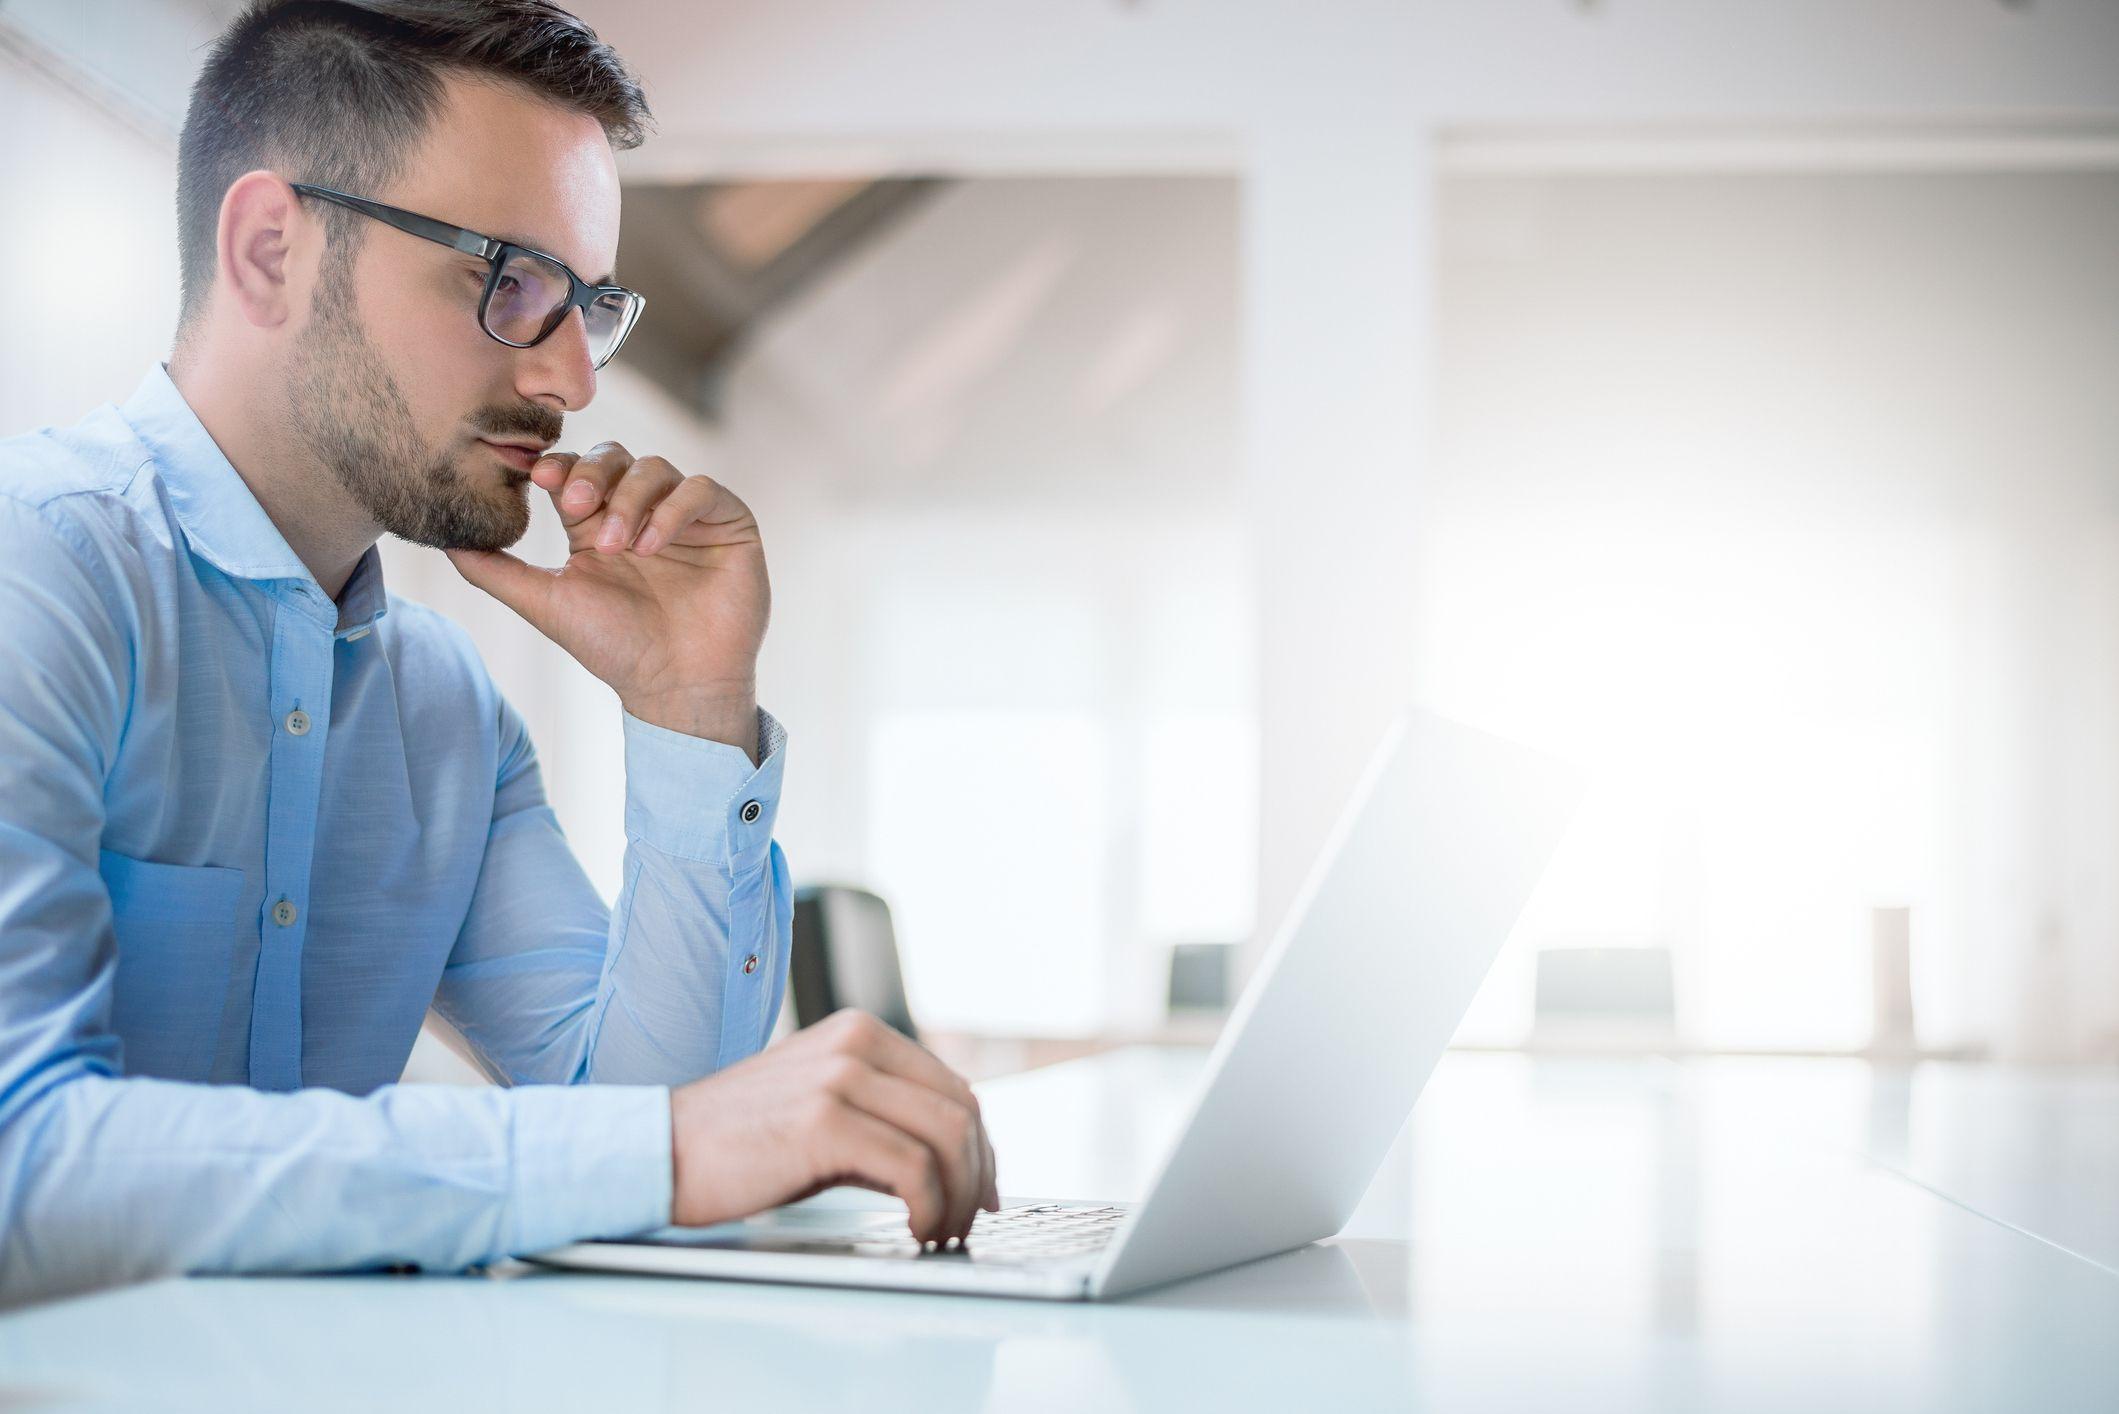 5 LinkedIn Strategies to Help Grow Your Career